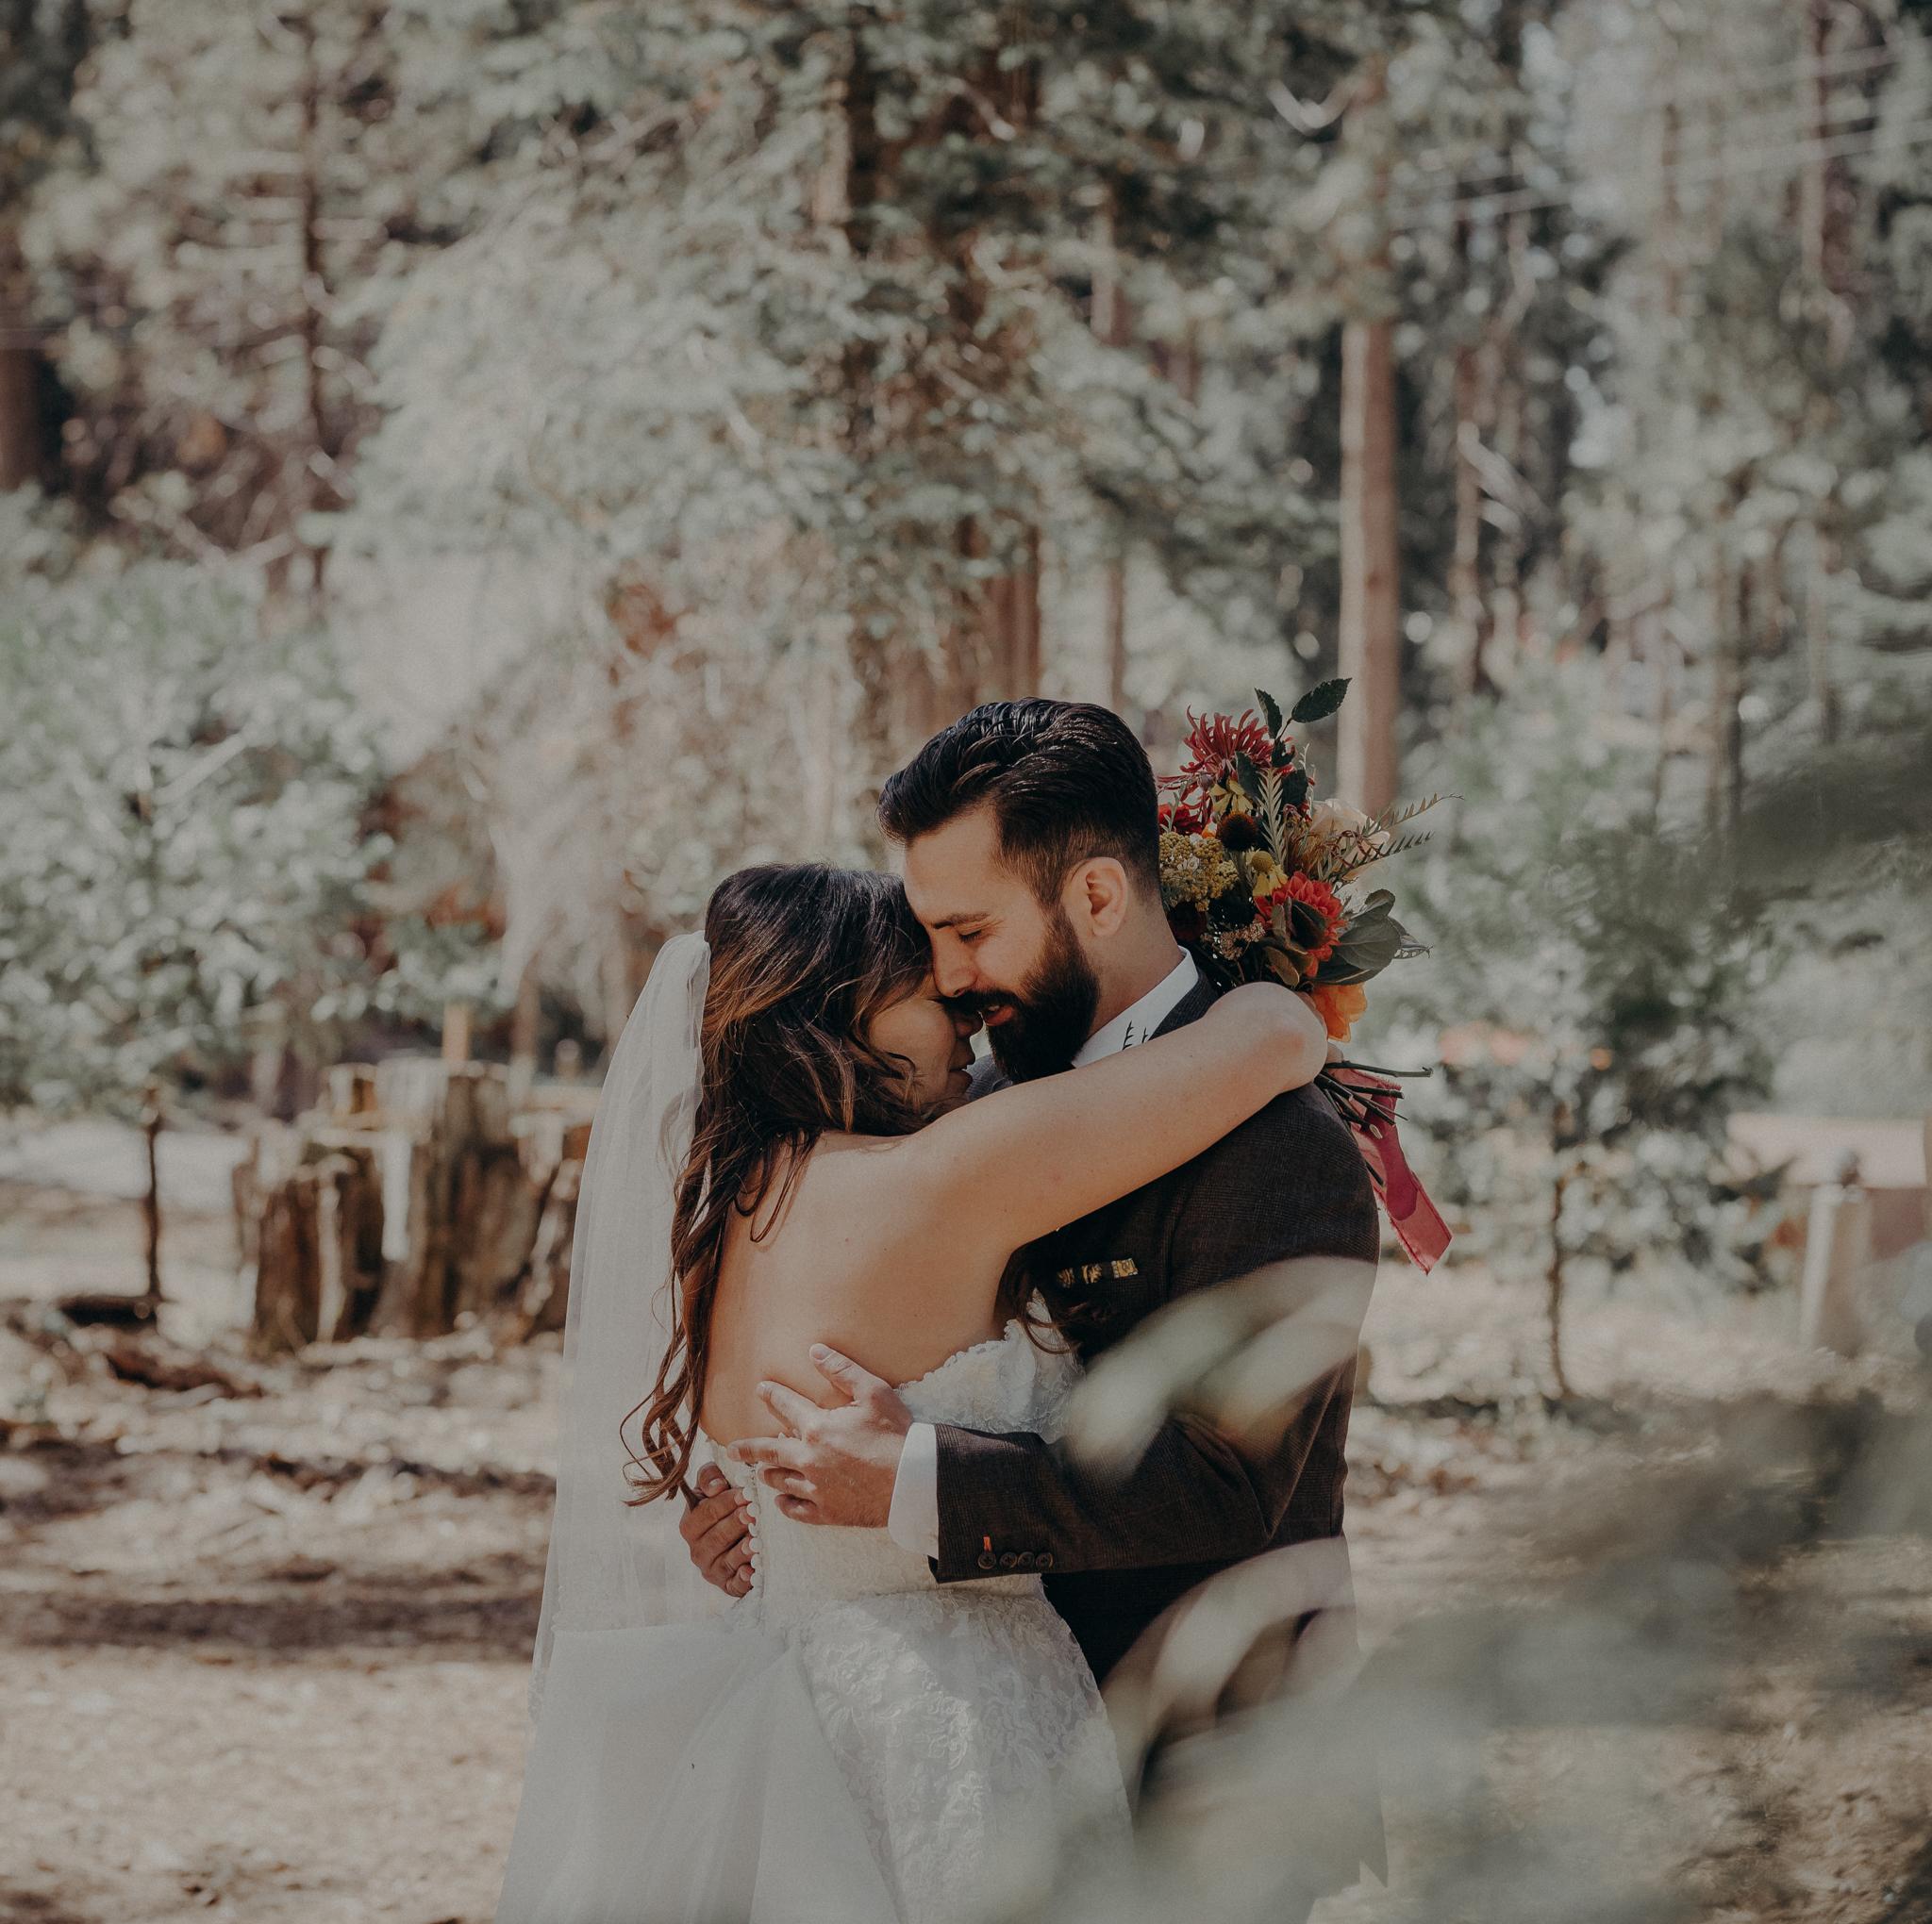 Yosemite Elopement Photographer - Evergreen Lodge Wedding Photographer - IsaiahAndTaylor.com-076.jpg